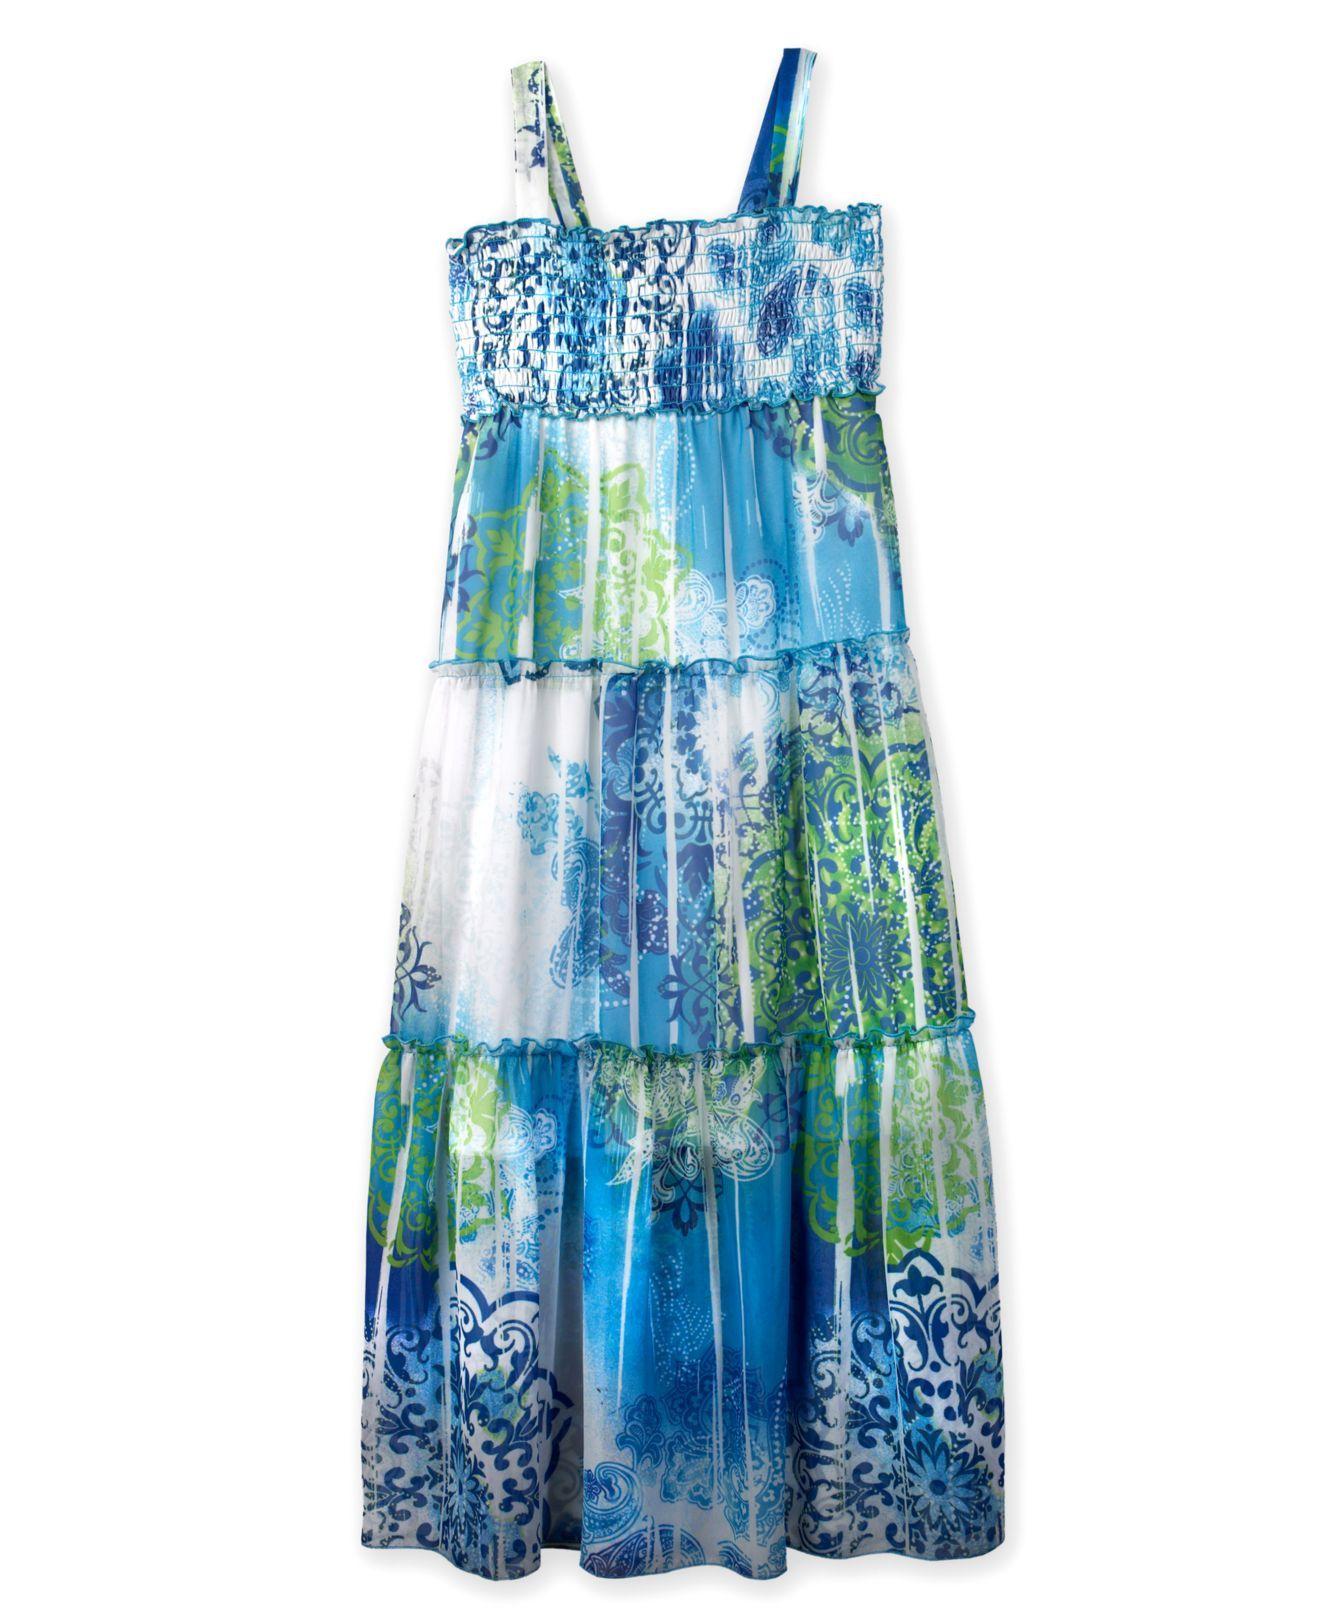 Bcx kids dress girls sublimation maxi dress kids girls macyus